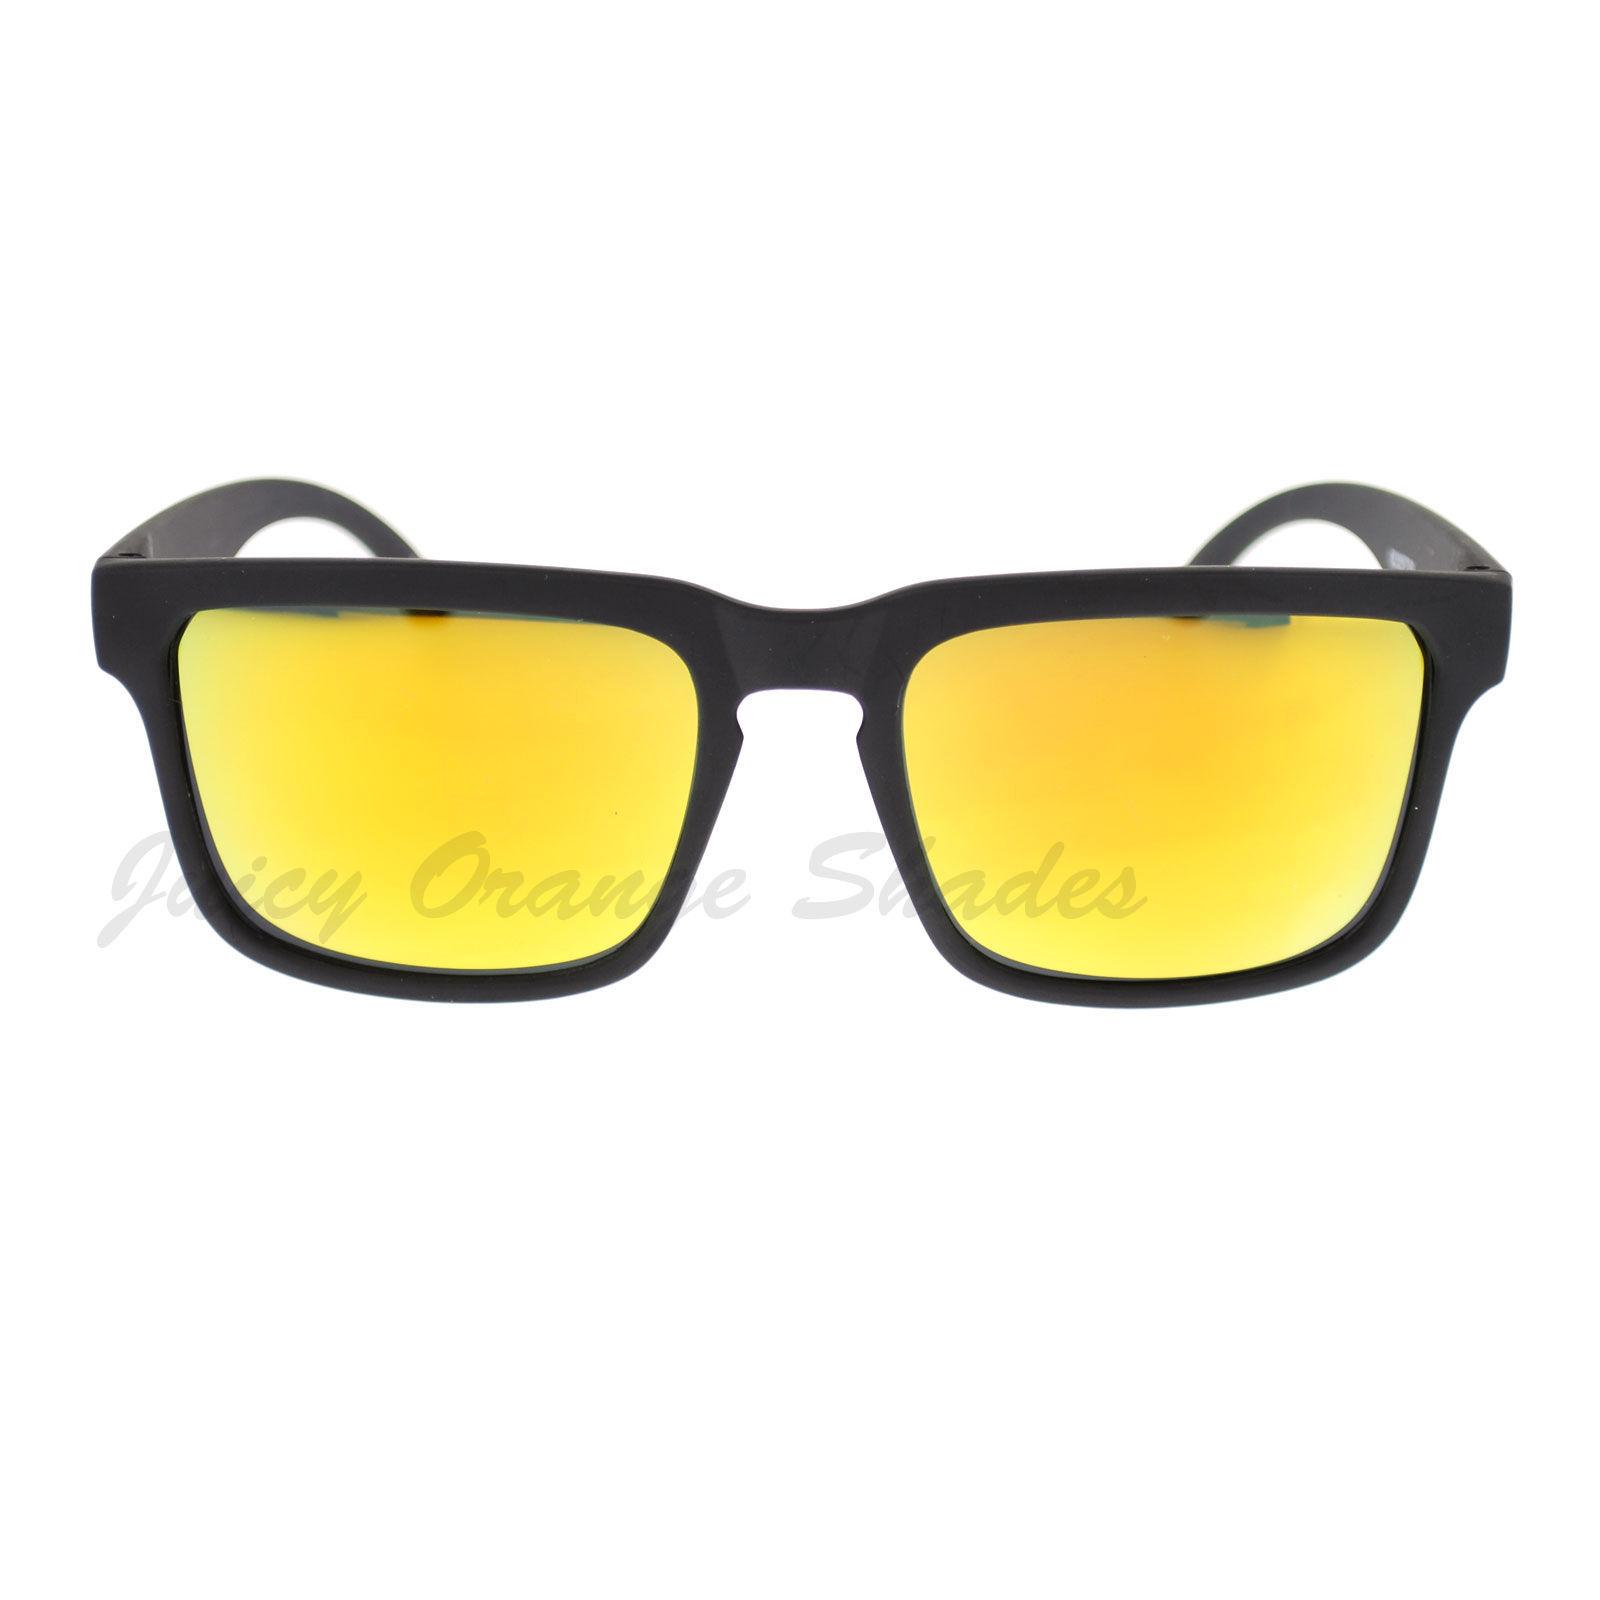 Soft Matted Square Rectangular Frame Sunglasses Multicolor Mirror Lens